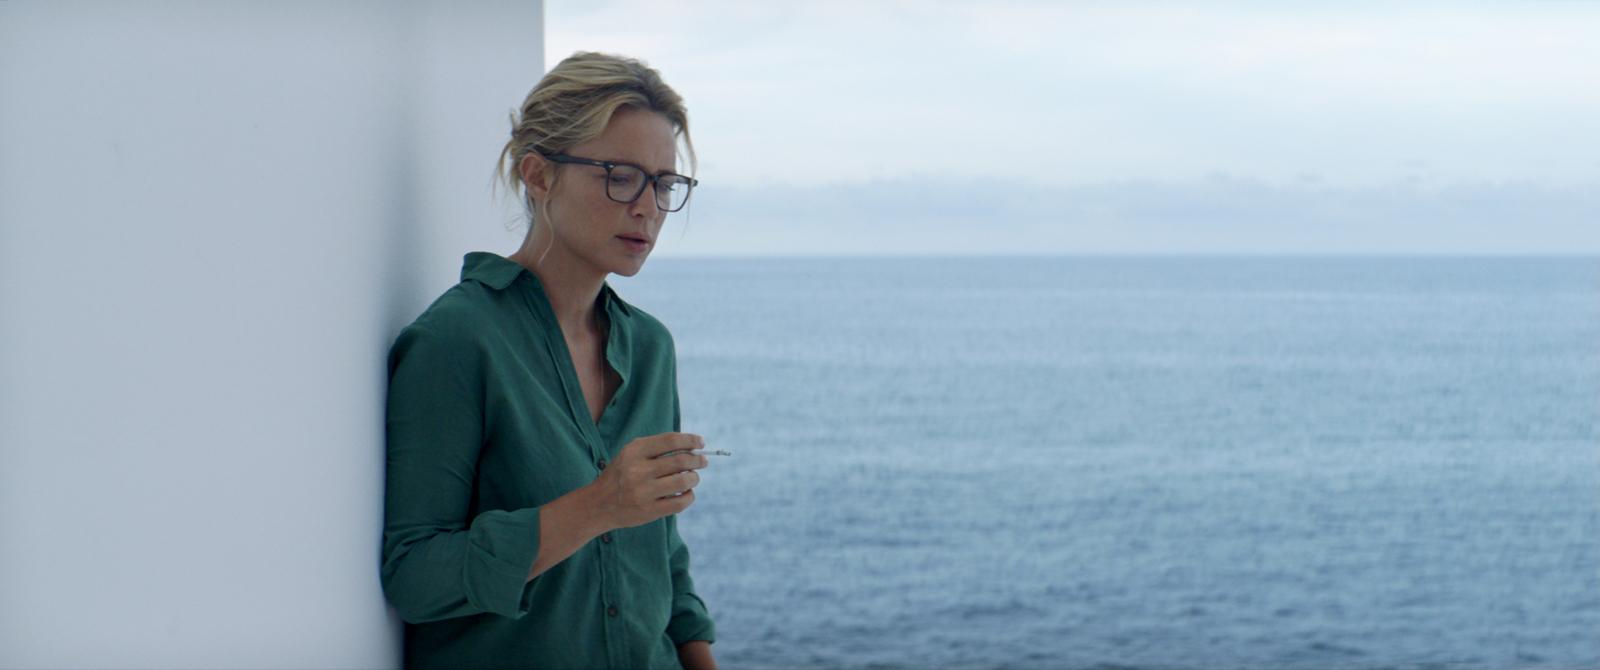 Sibyl - Photo Virginie Efira critique avis film cannes 2019 photo